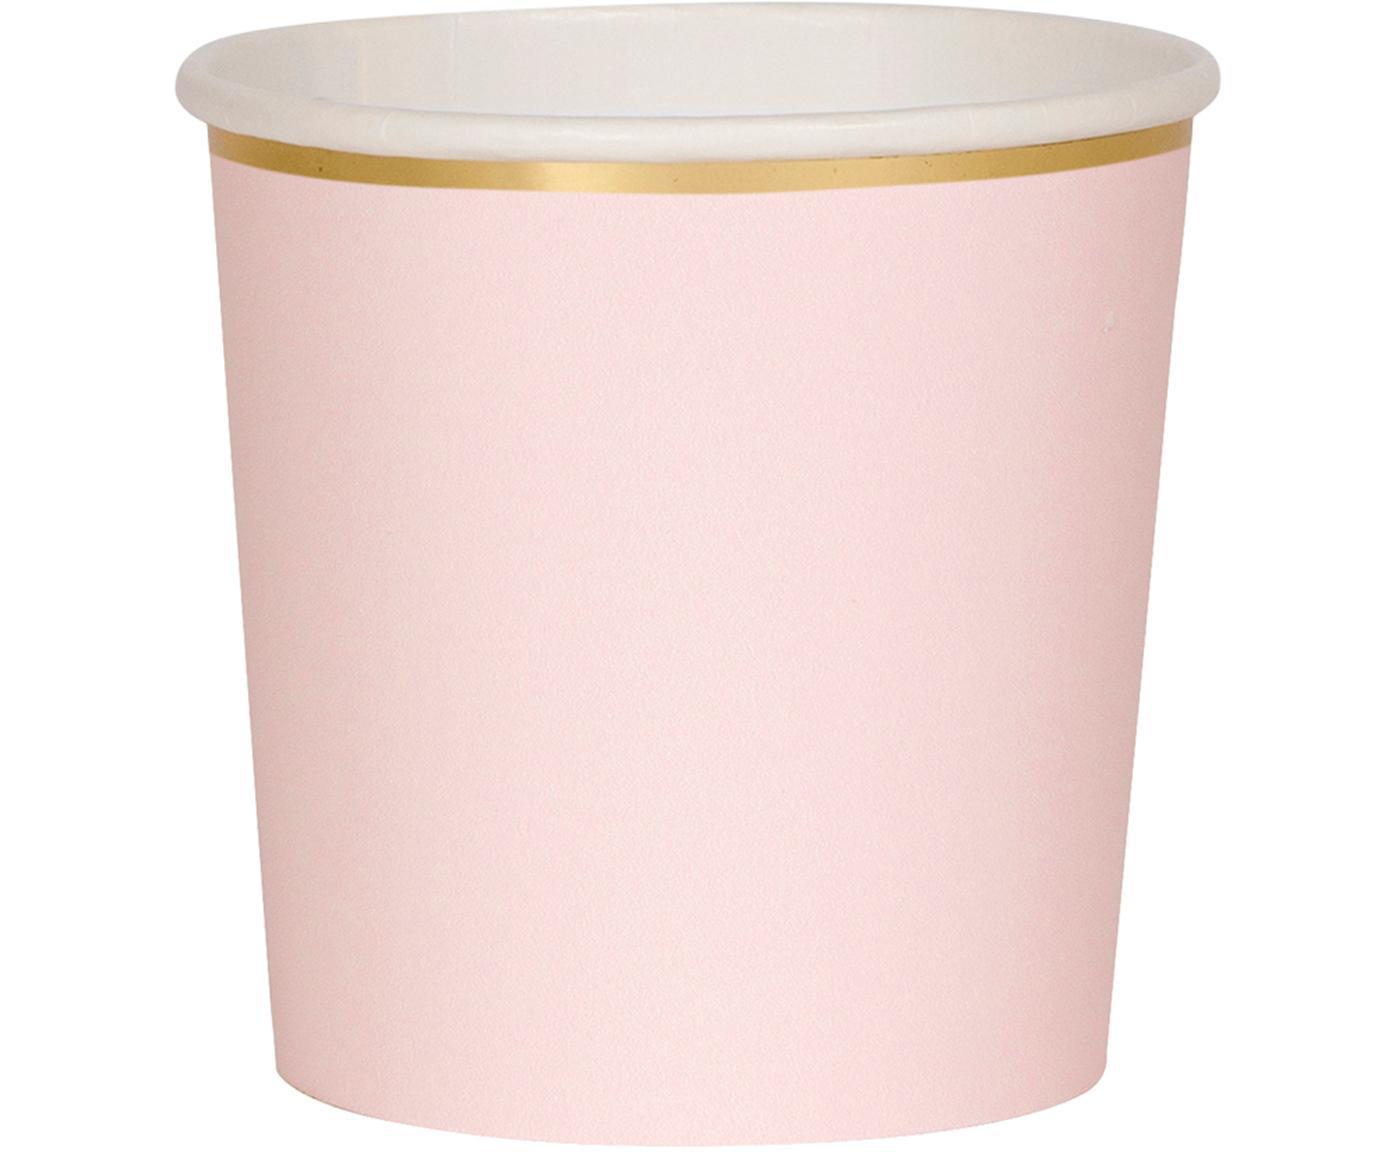 Vasos de papel Simply Eco, 8uds., Papel, foliert, Rosa, Ø 8 x Al 8 cm